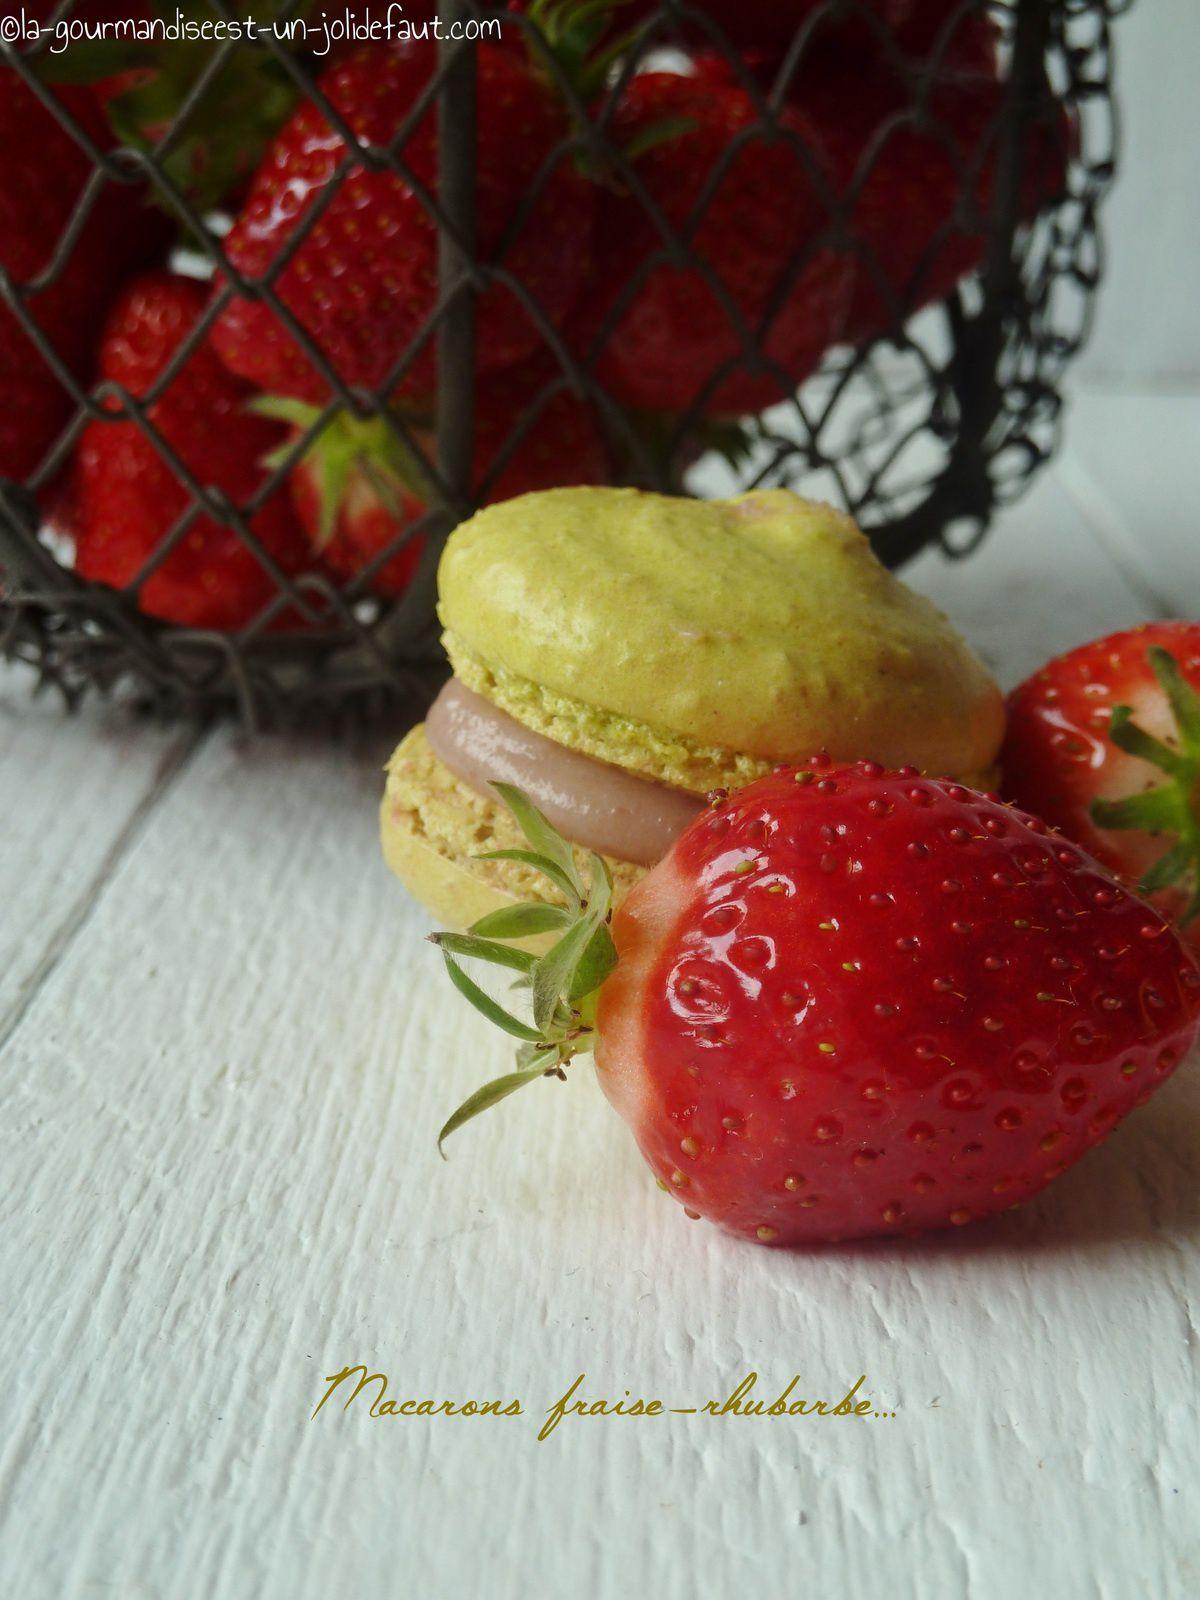 Macarons fraise-rhubarbe